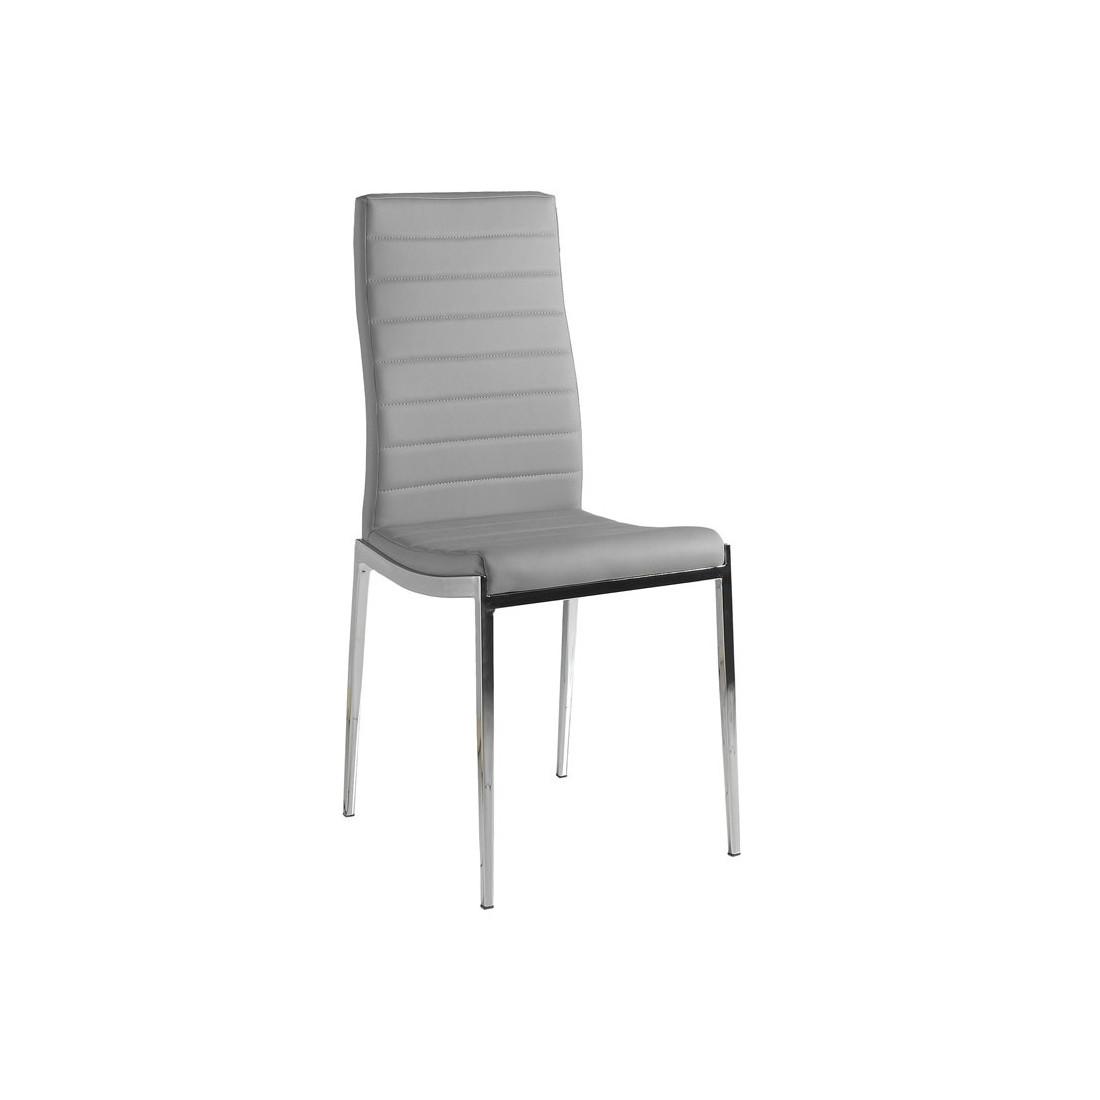 quatuor de chaises eco cuir gris et inox vilma univers des assises. Black Bedroom Furniture Sets. Home Design Ideas